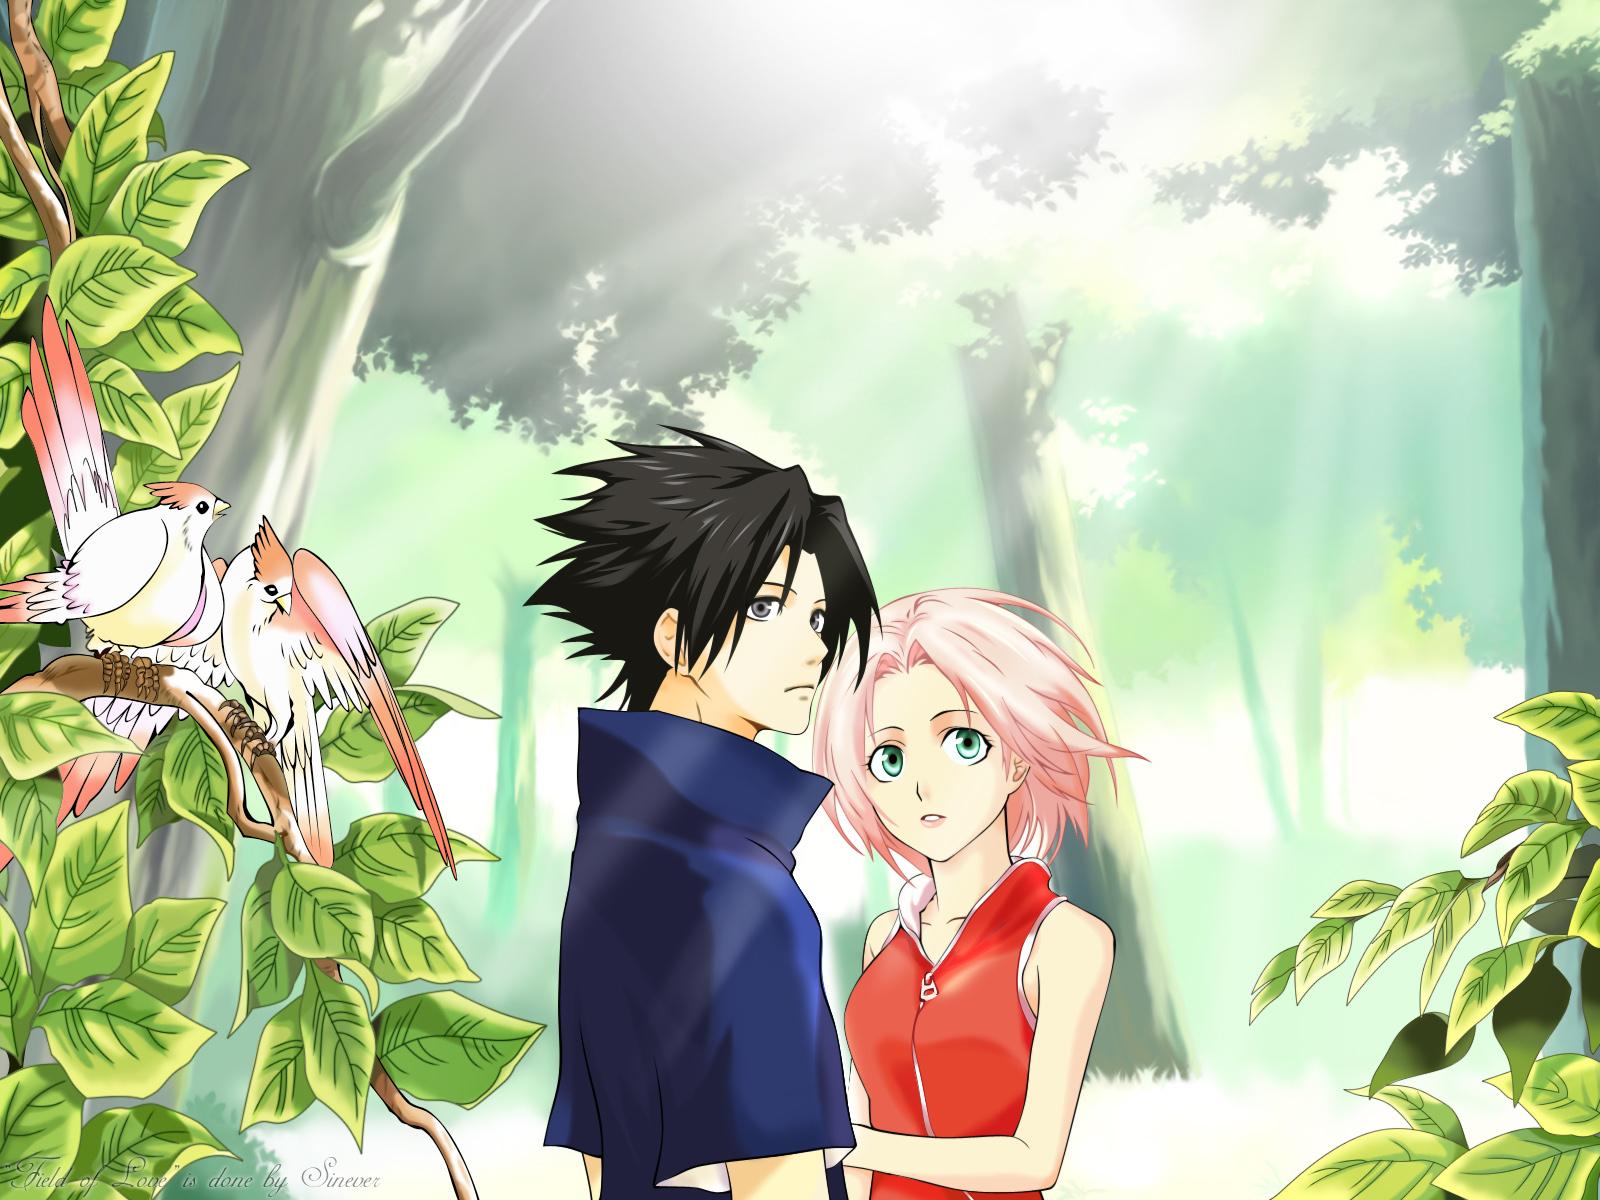 sasuke protects sakura wallpaper - photo #15